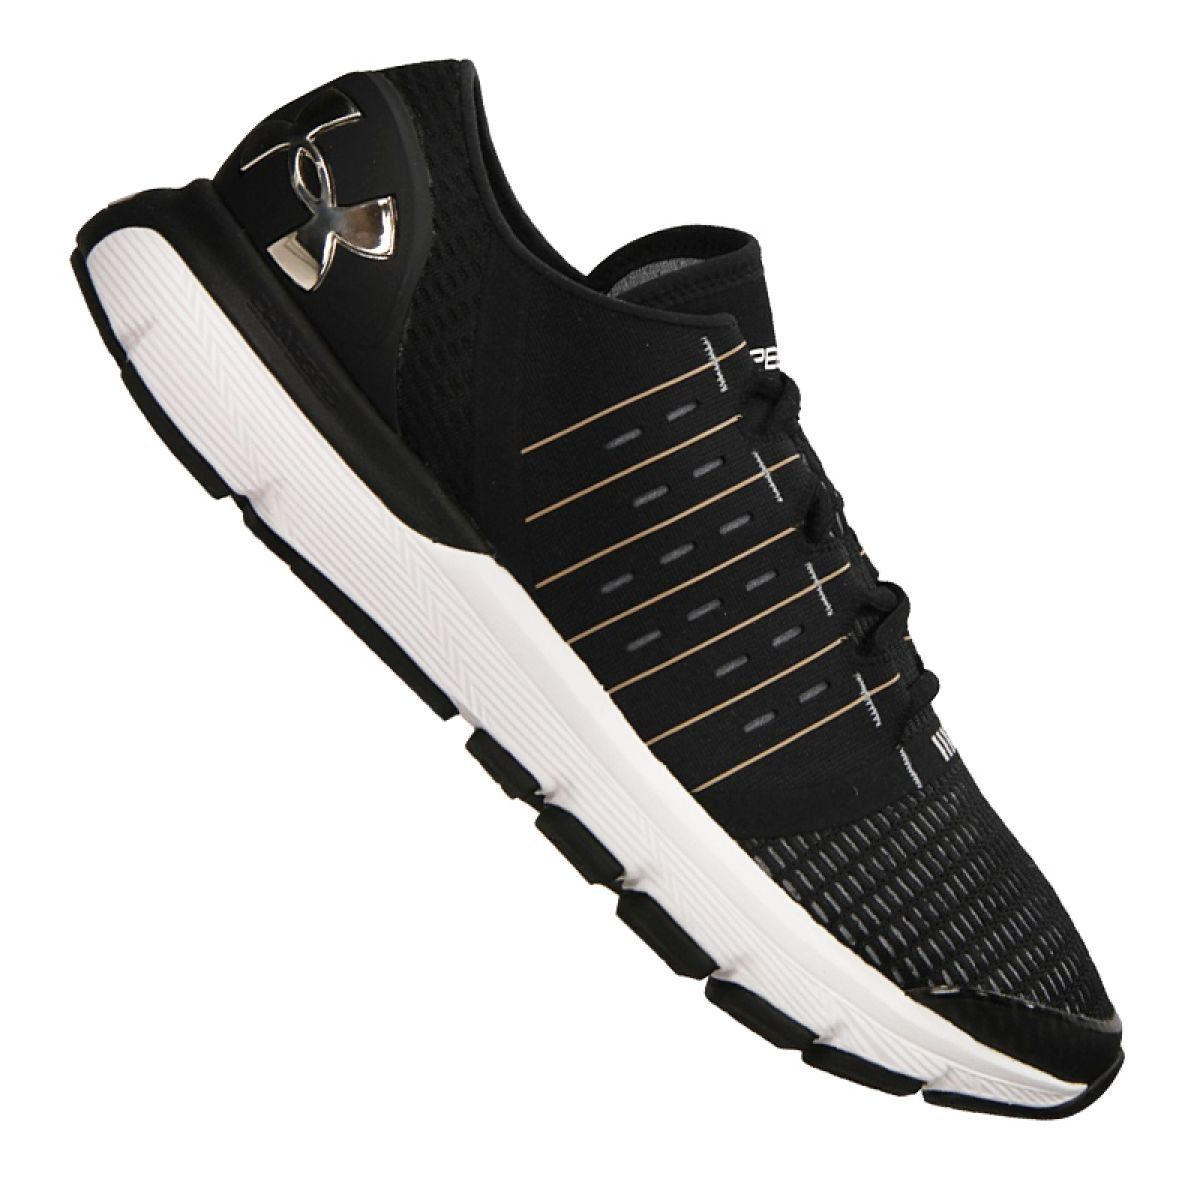 Sports Men S Underarmour Under Armour Under Armor Speedform Europa M 1285653 004 Training Shoes Black Training Shoes Under Armour Men S Shoes